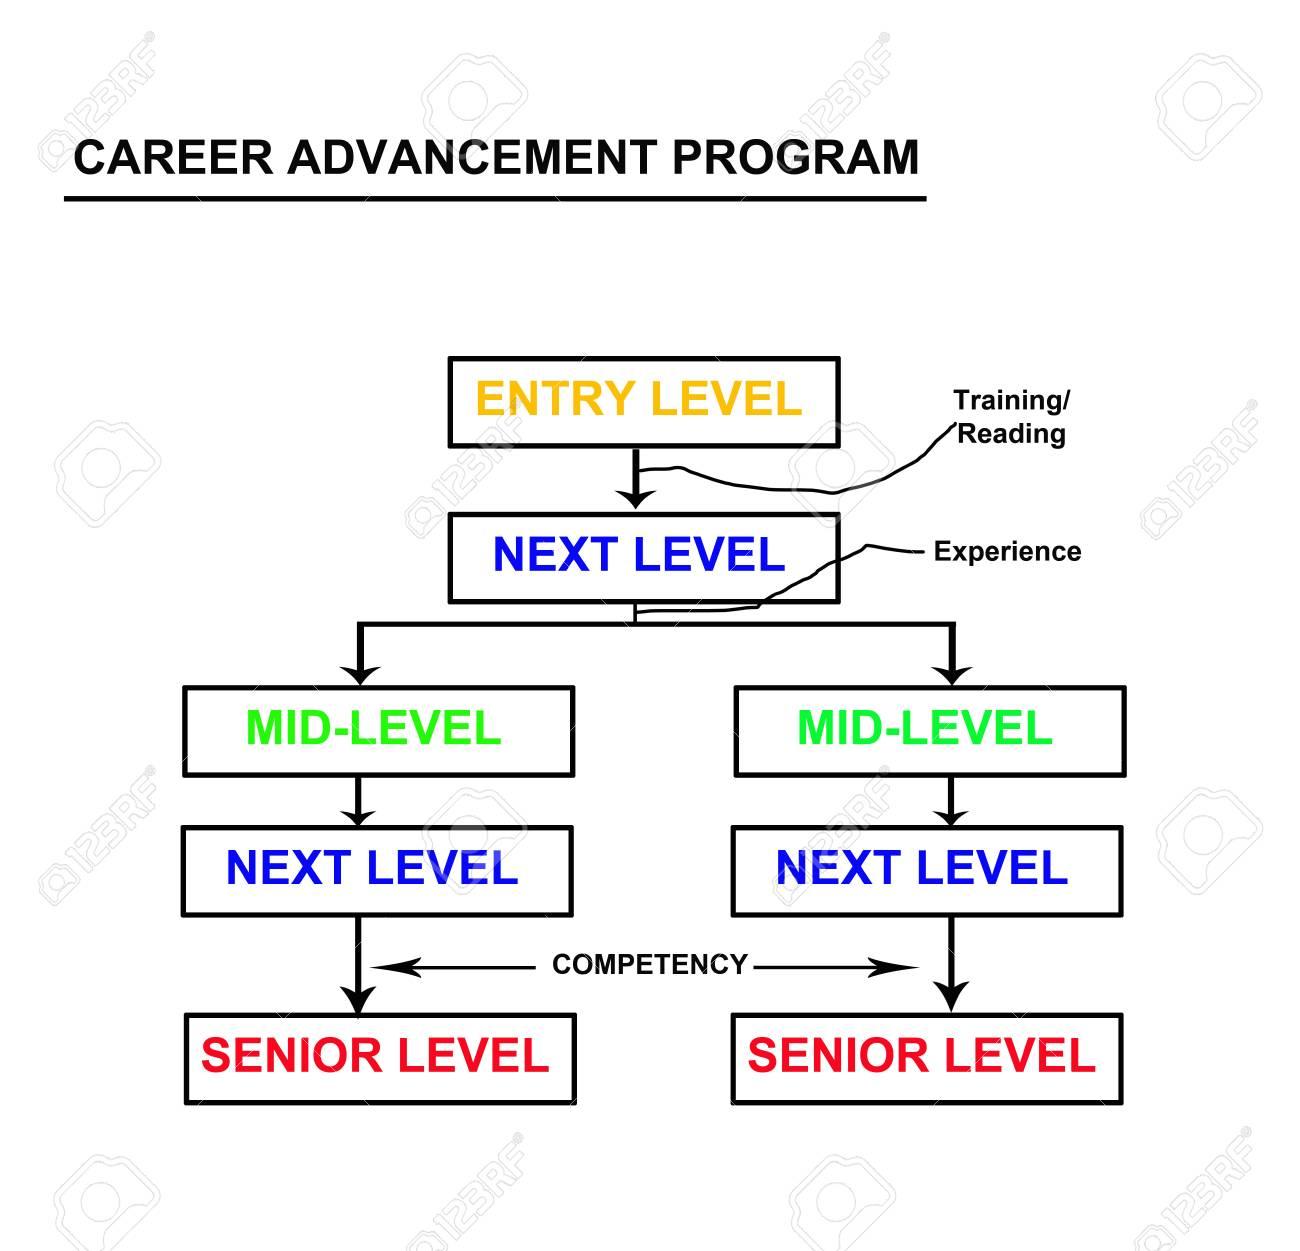 career focus in an advancement program flowchart abstract my original ideas stock photo 15358873 - Career Flowchart